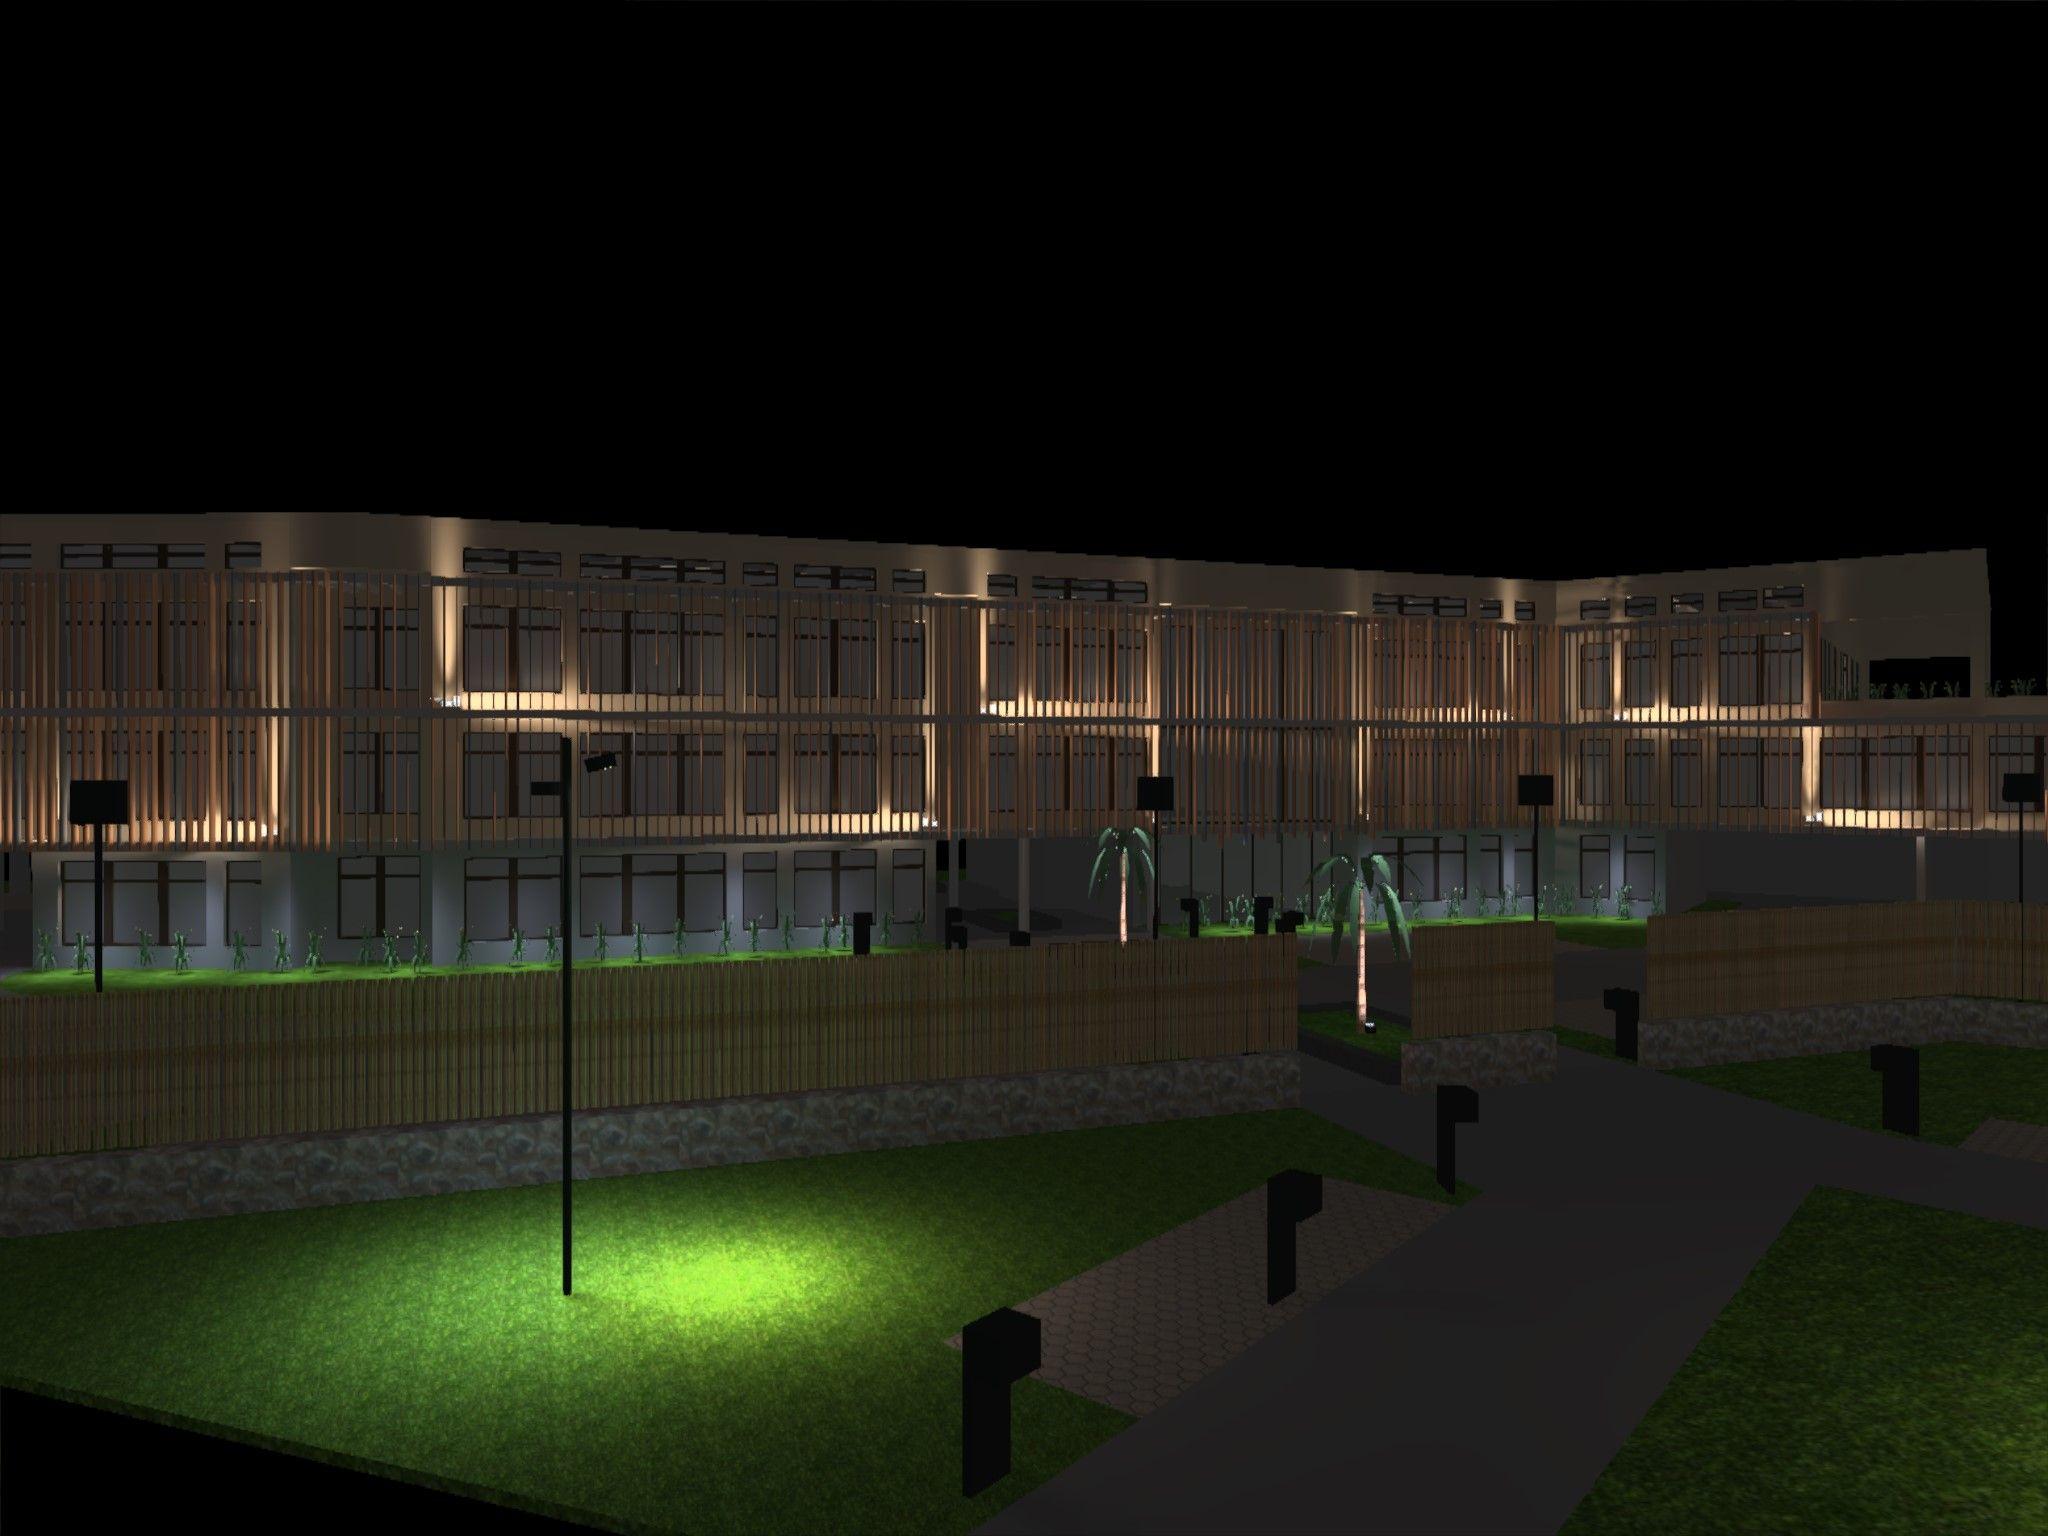 Eclairage Scenique Facade Contemporary Architecture Outdoor Lighting